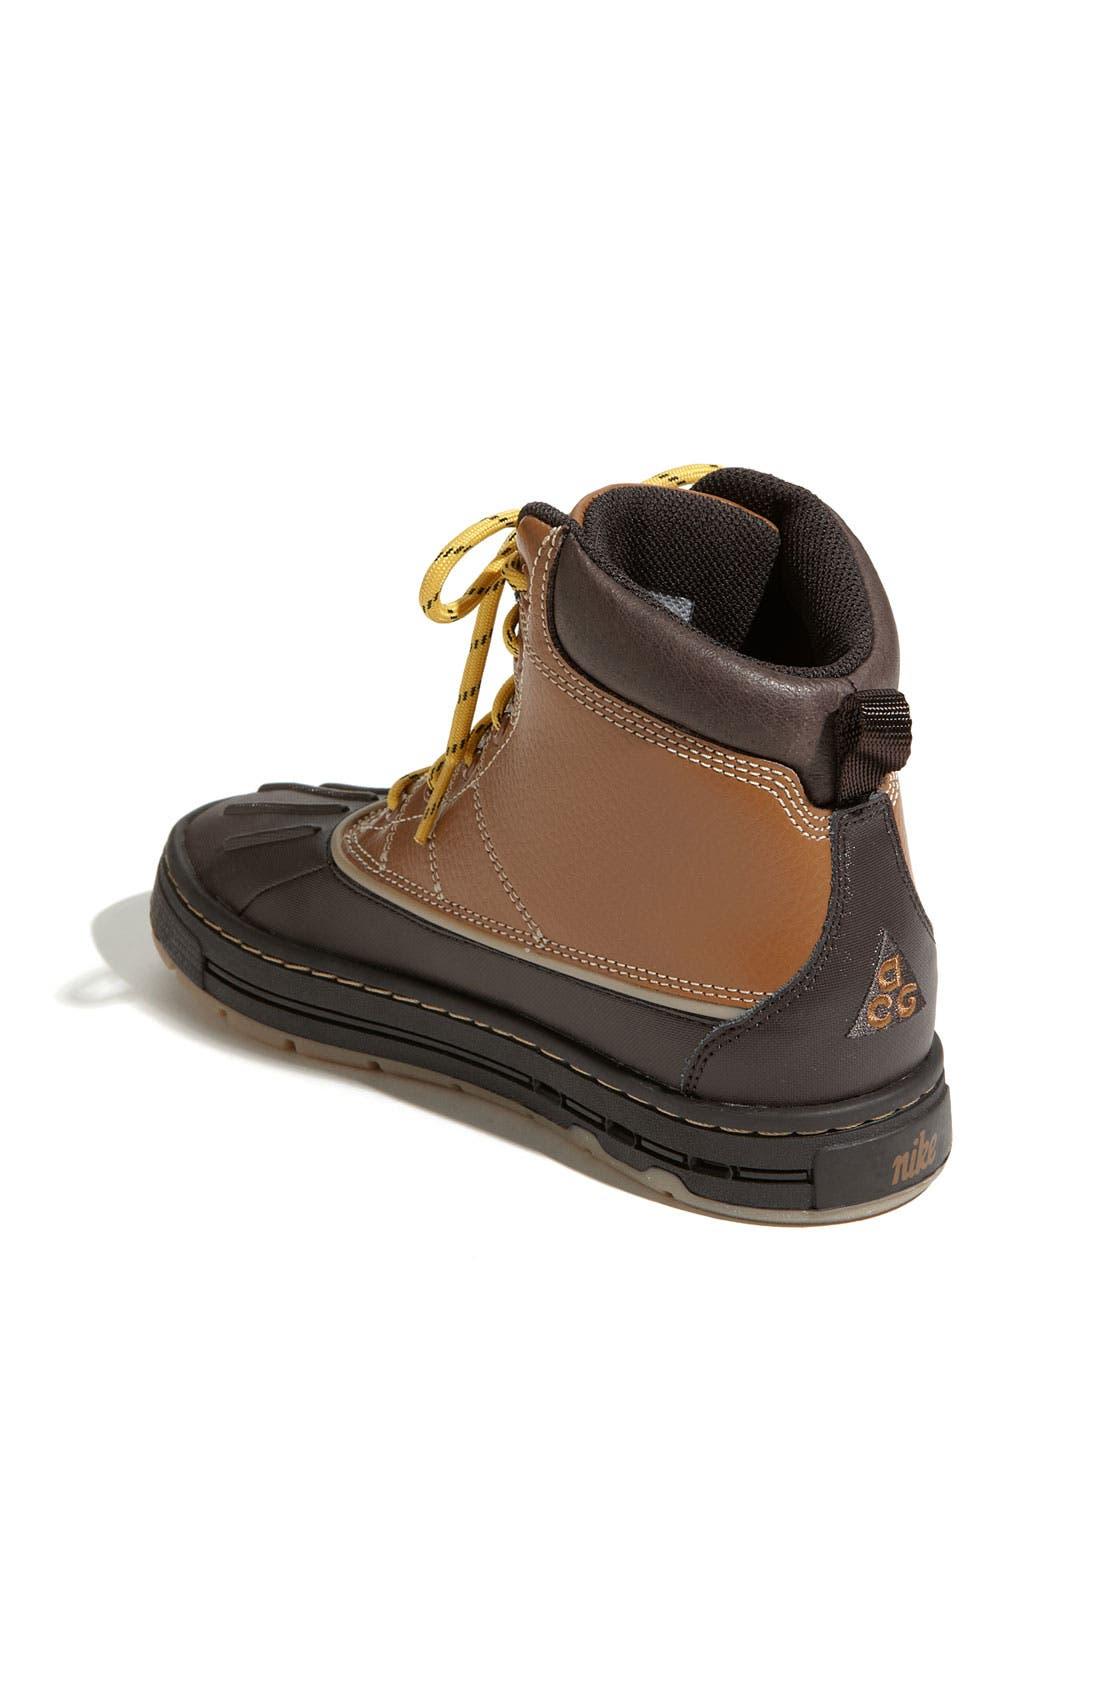 Alternate Image 2  - Nike 'Woodside' Hiking Boot (Toddler, Little Kid & Big Kid)